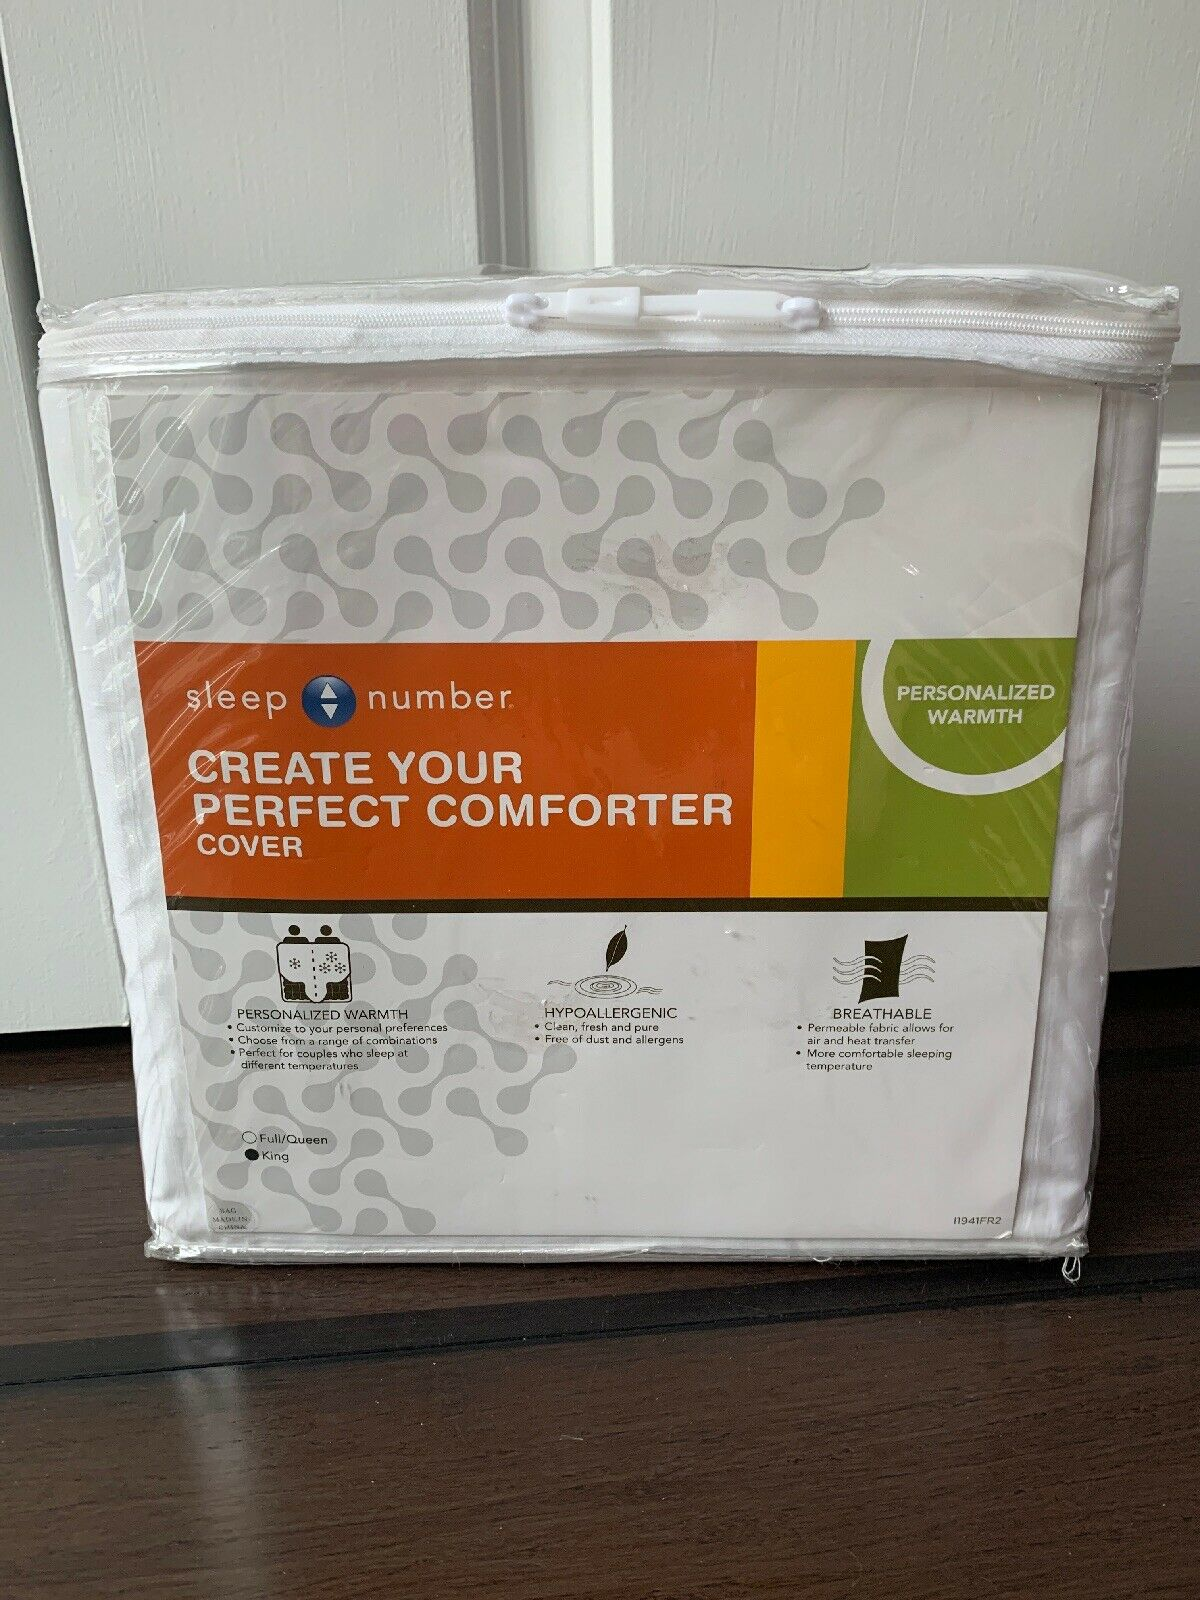 NEW Sleep Number Create Your Perfect Comforter Duvet Startseite- König  421566. Sealed